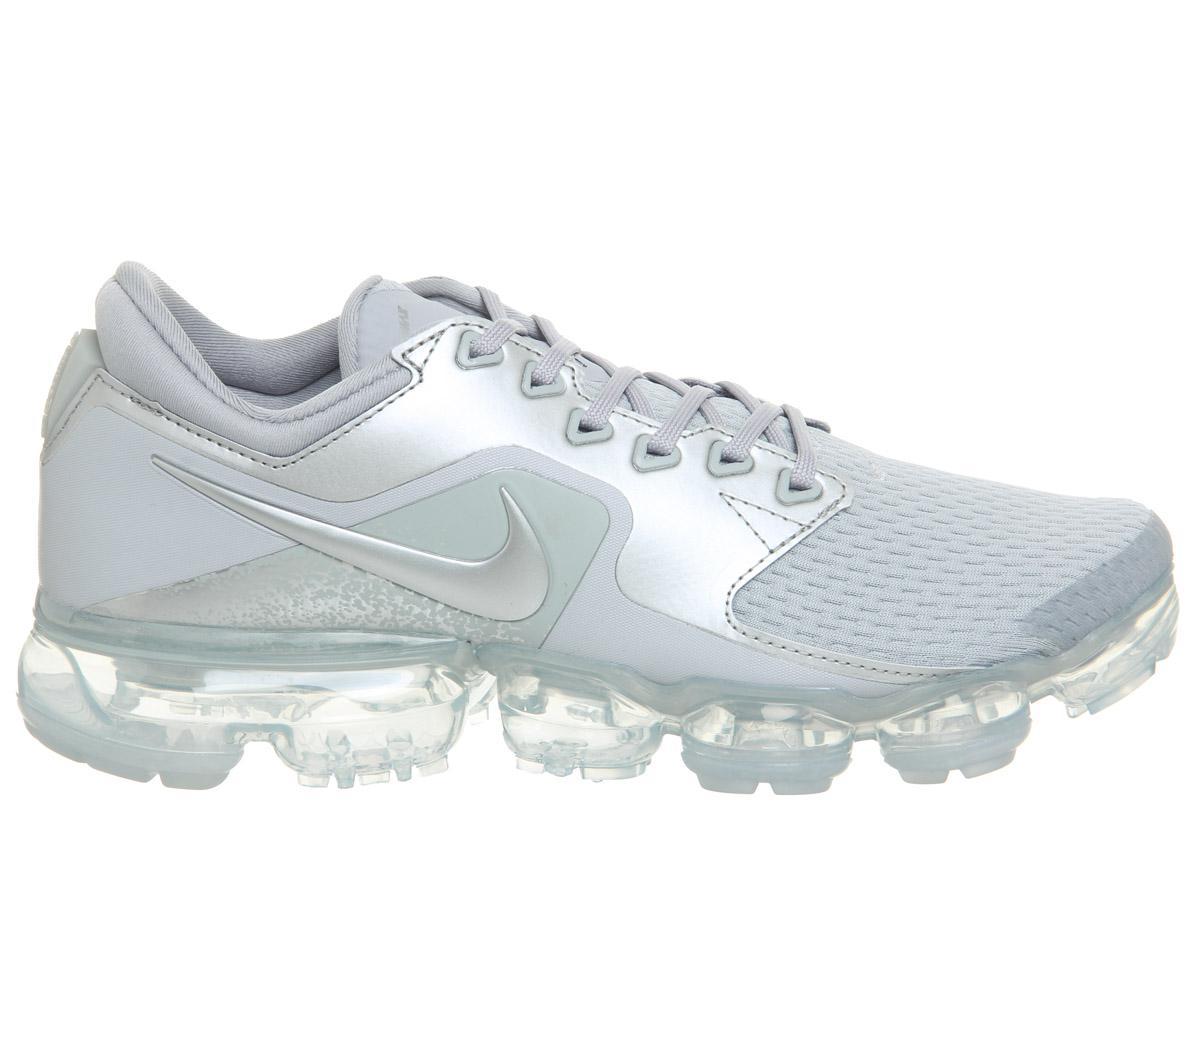 e56765310d0 NWT Comme des Garcons Nike White Air Vapormax FK CDG